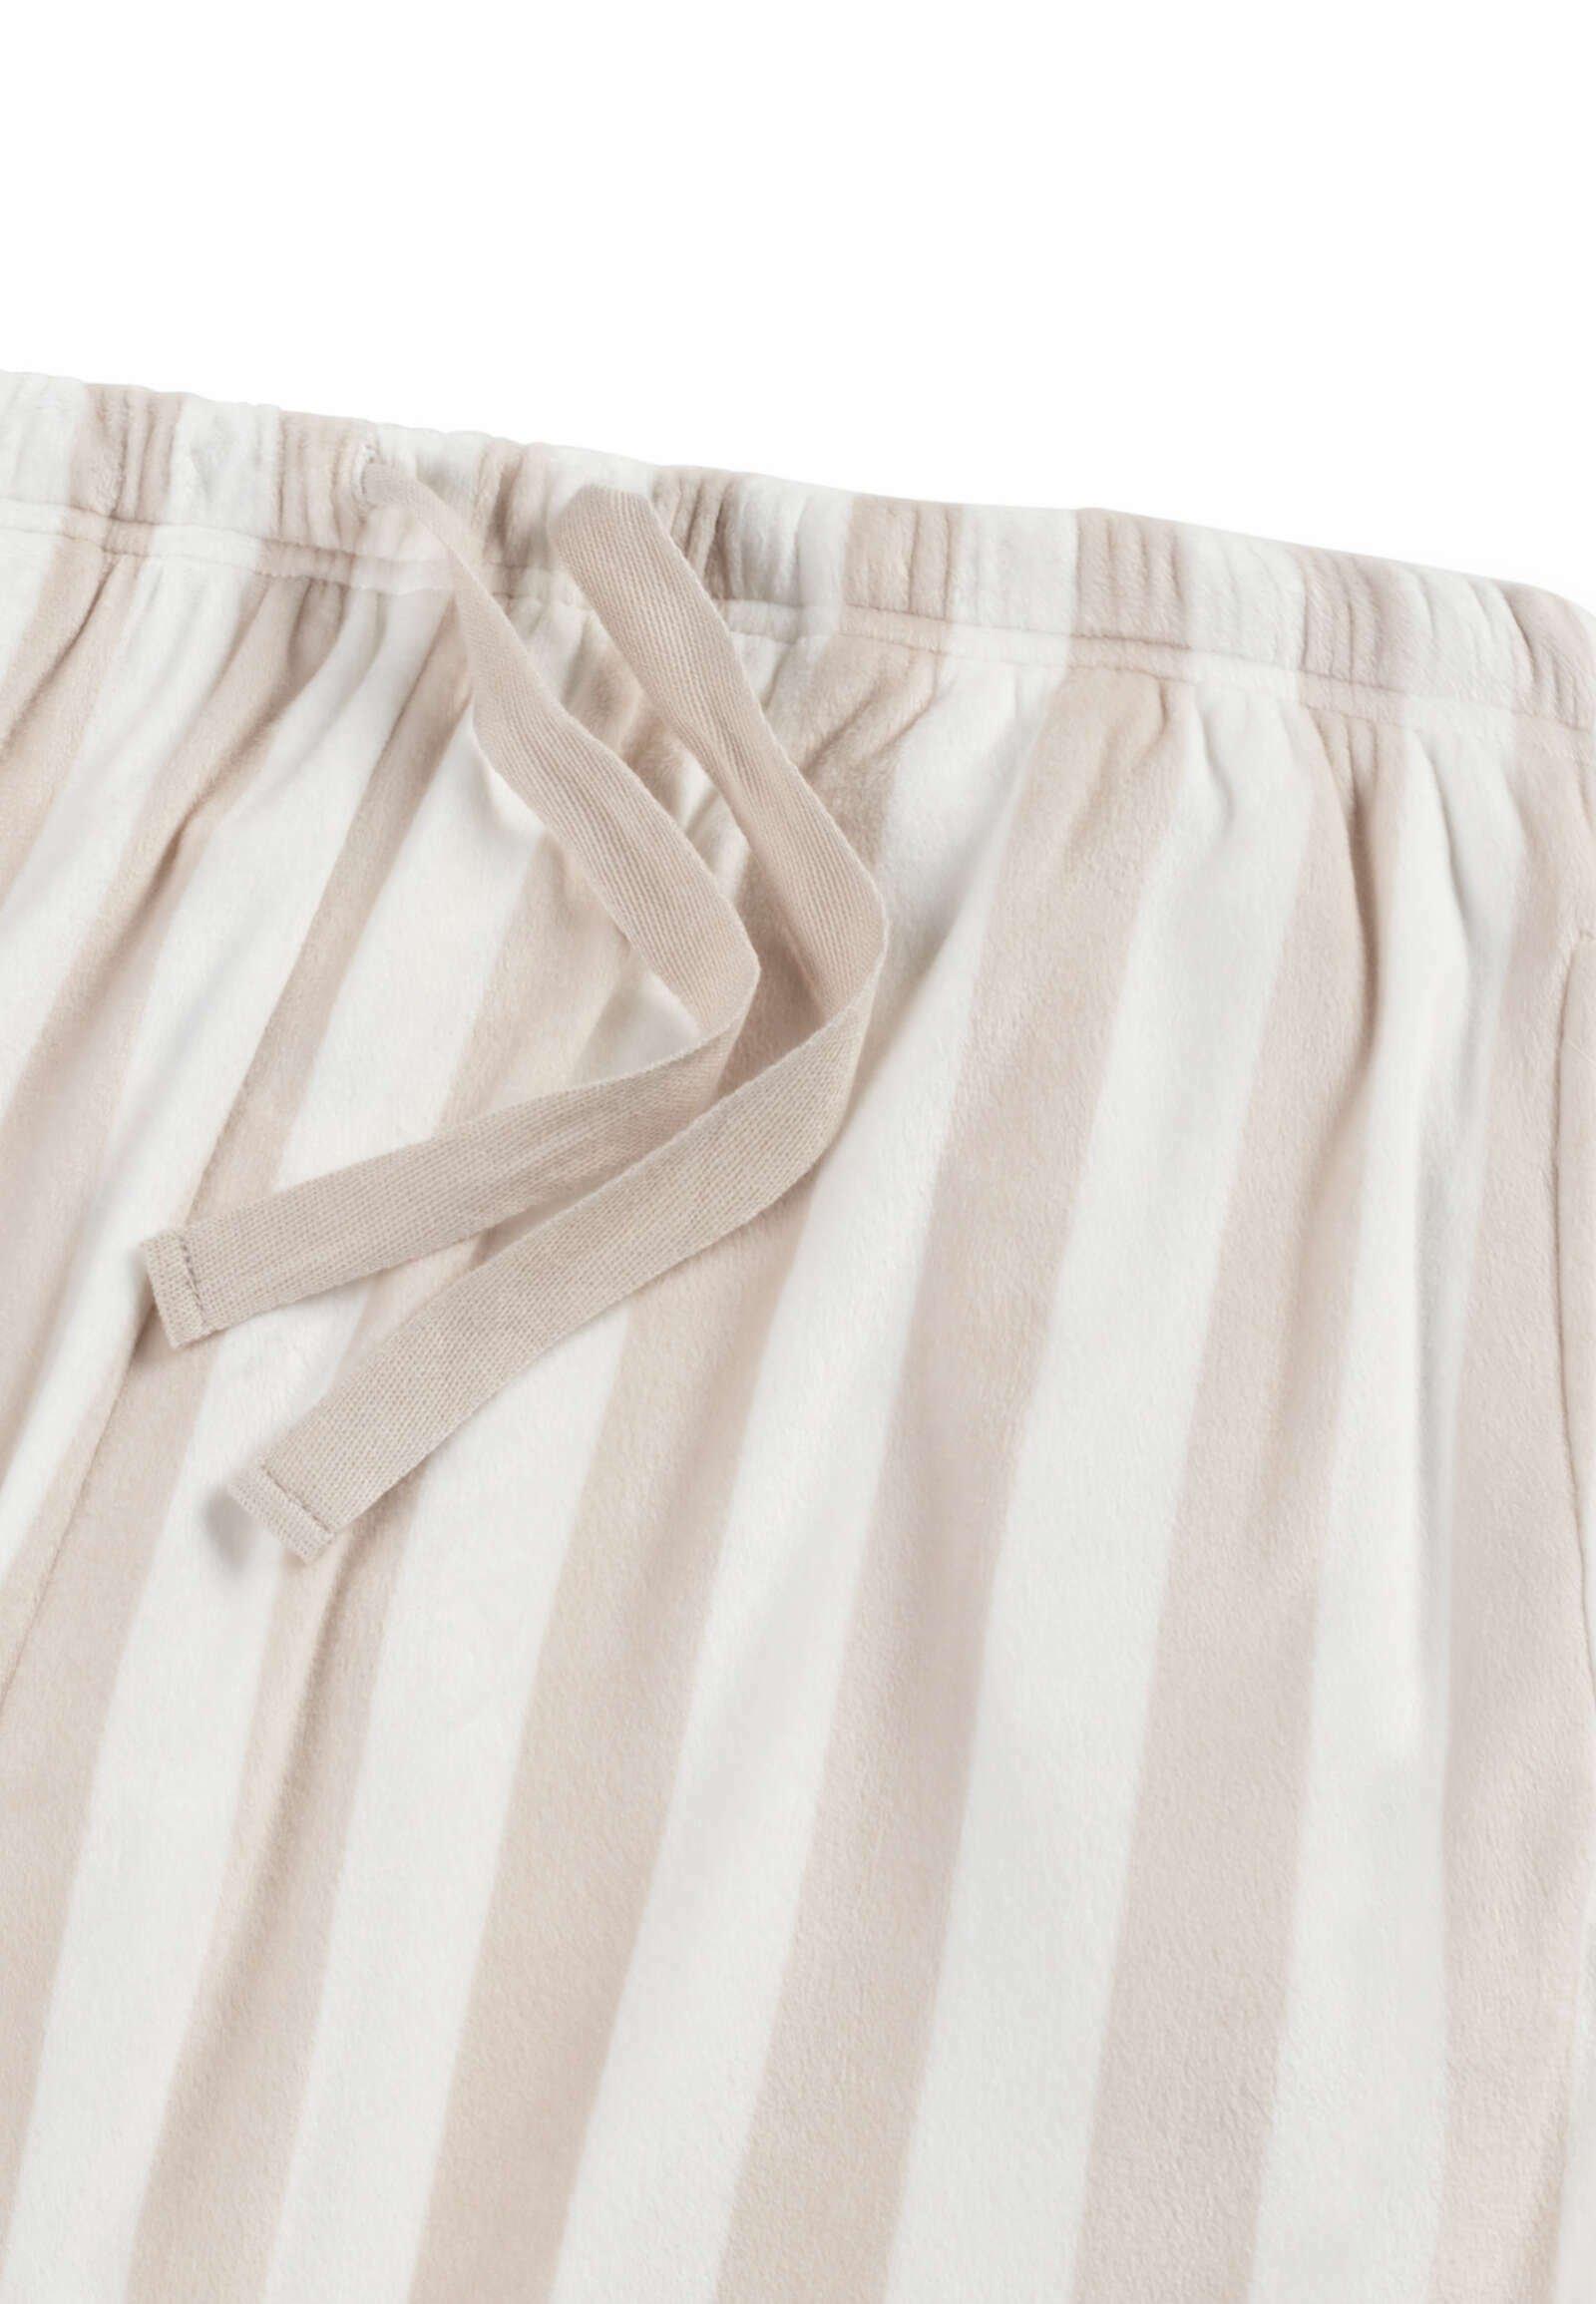 Donna WEICHEM VELOURS 32033742 - Pantaloni del pigiama